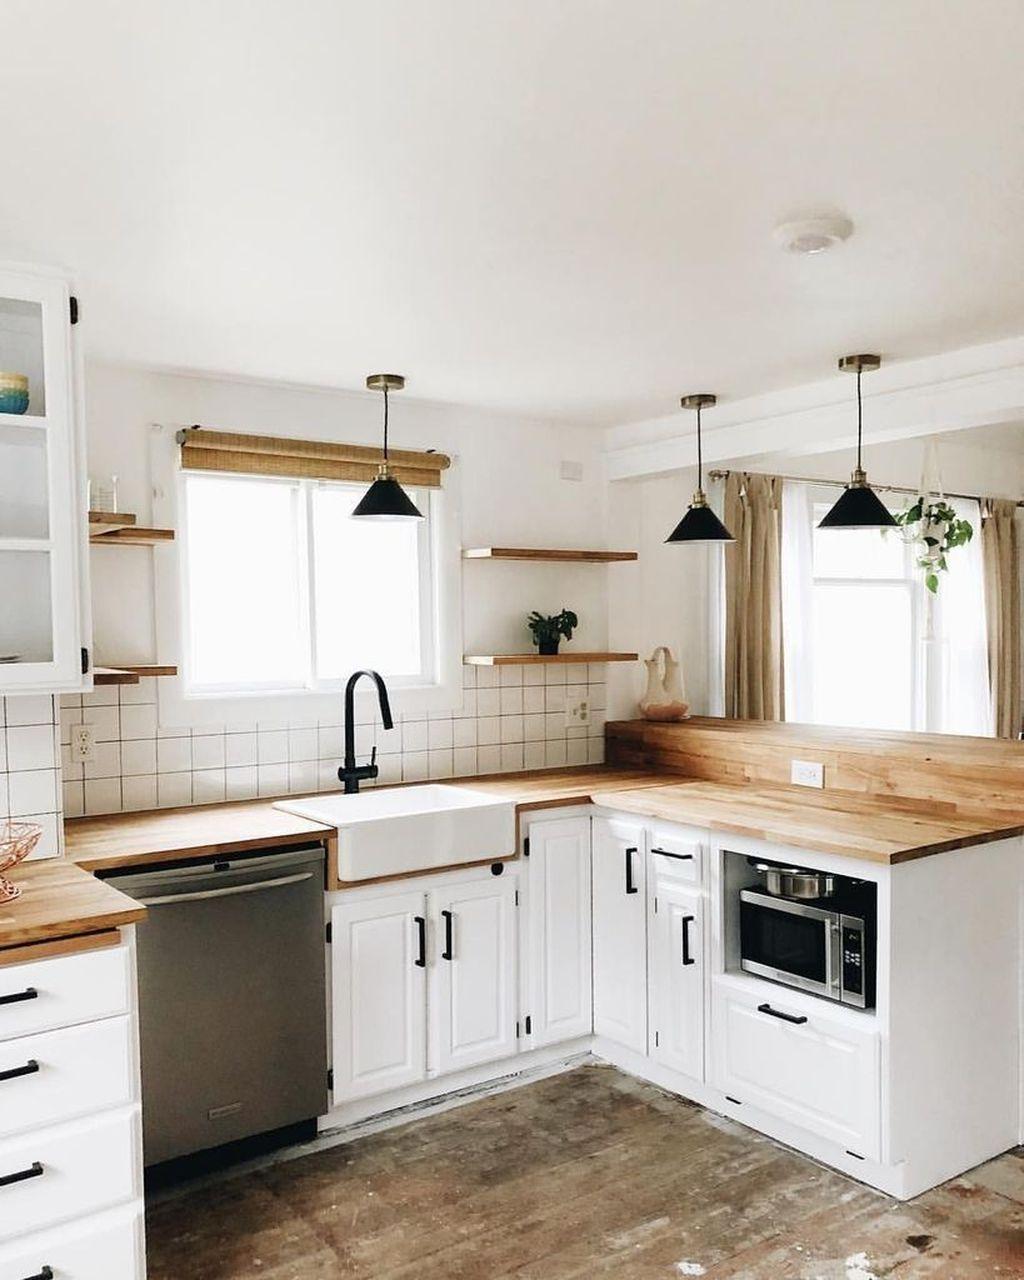 Popular Apartment Kitchen Design Ideas You Should Copy 06